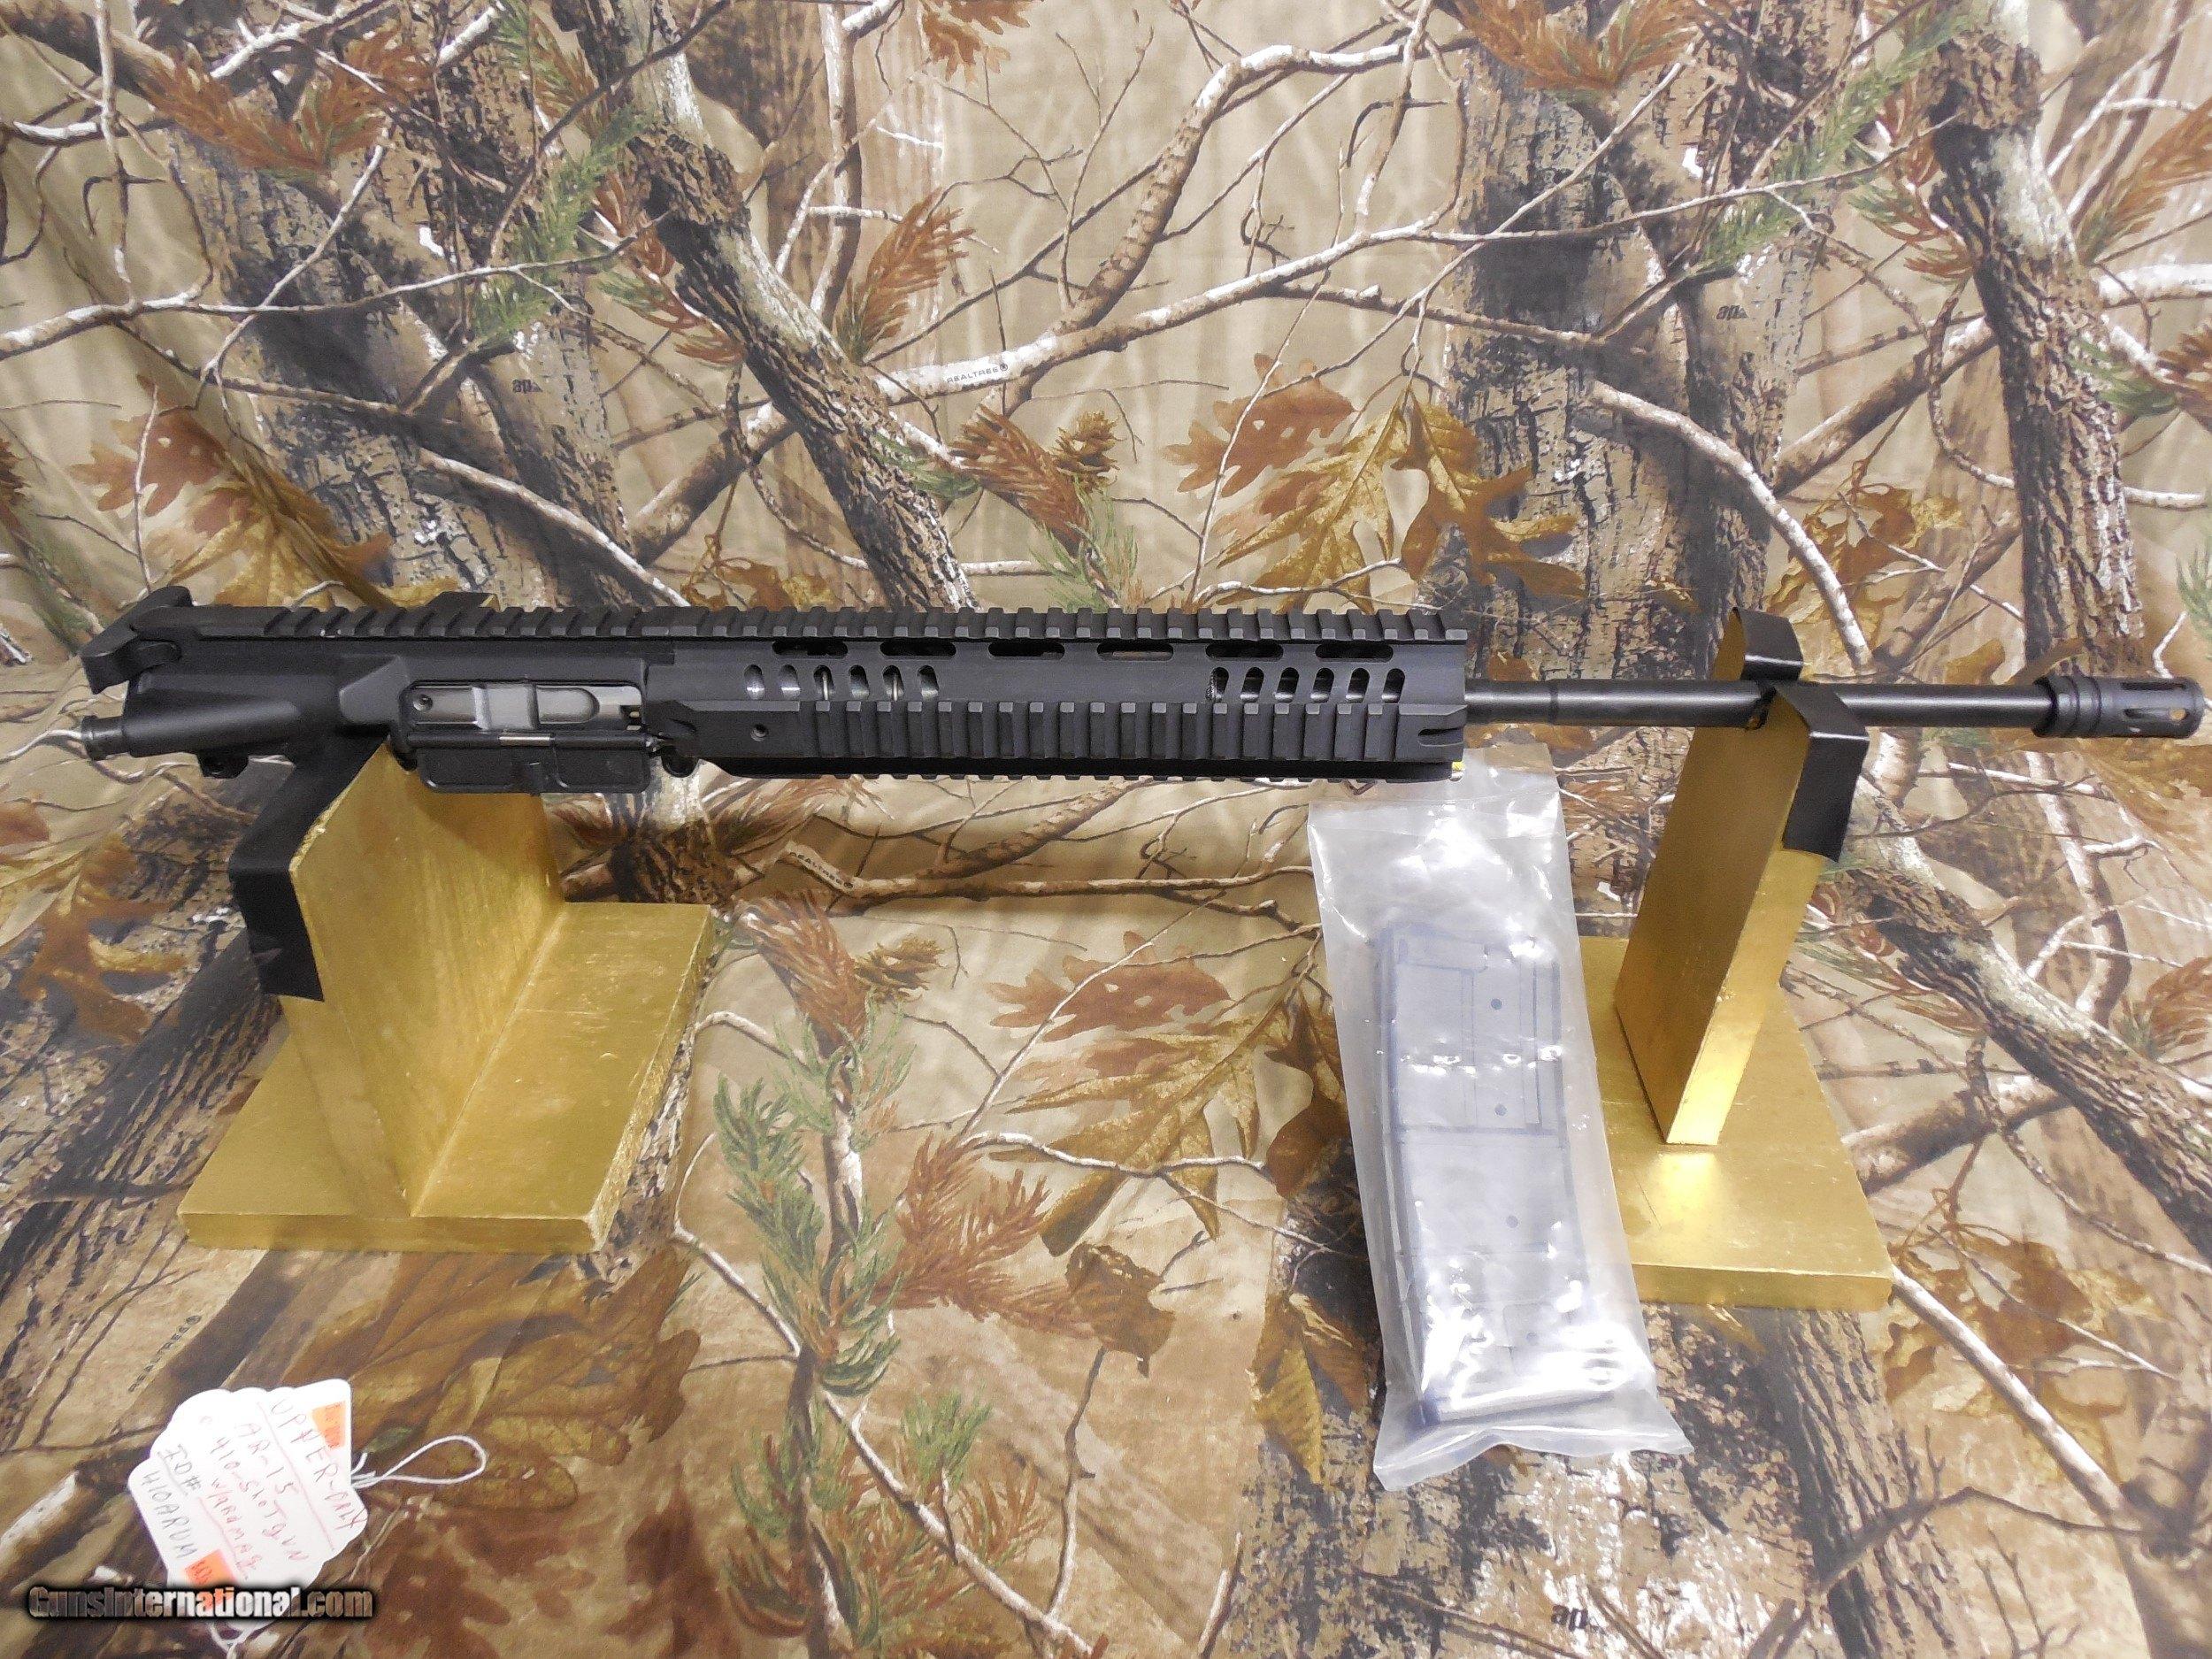 AR-15, IFC 410 AURM COMPLETE UPPER FOR AR-15, 410 GAUGE